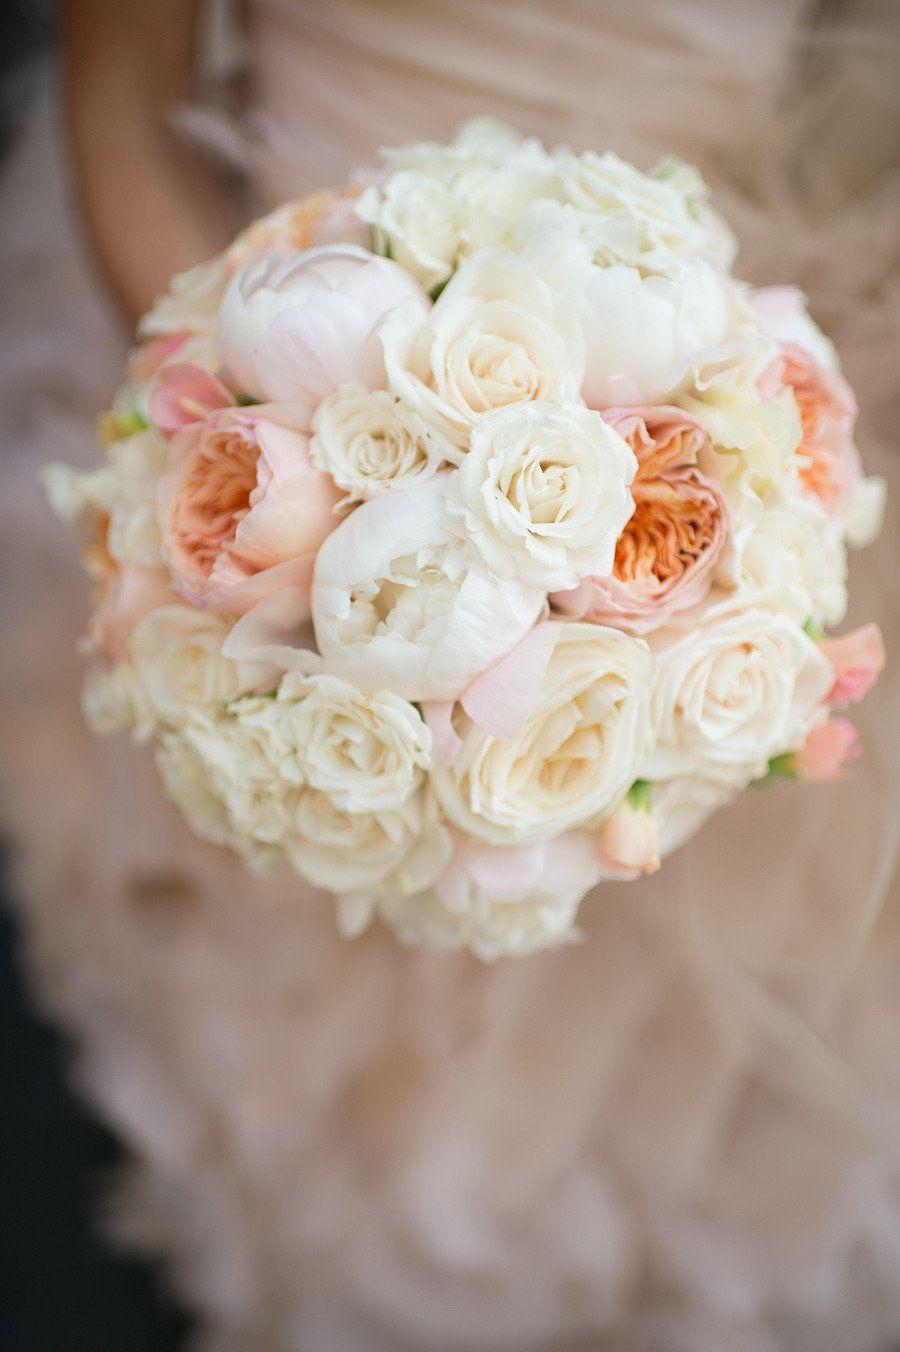 Tribeca Wedding from Brian Hatton Photography  #white #peach #wedding